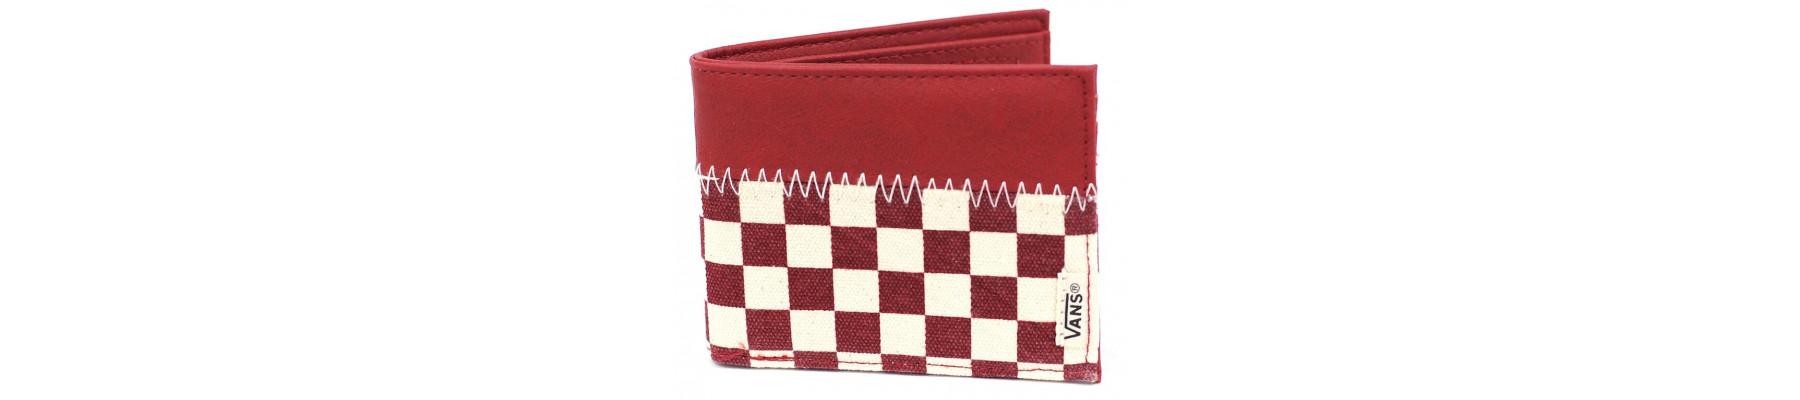 Vans Doheny Wallet Red